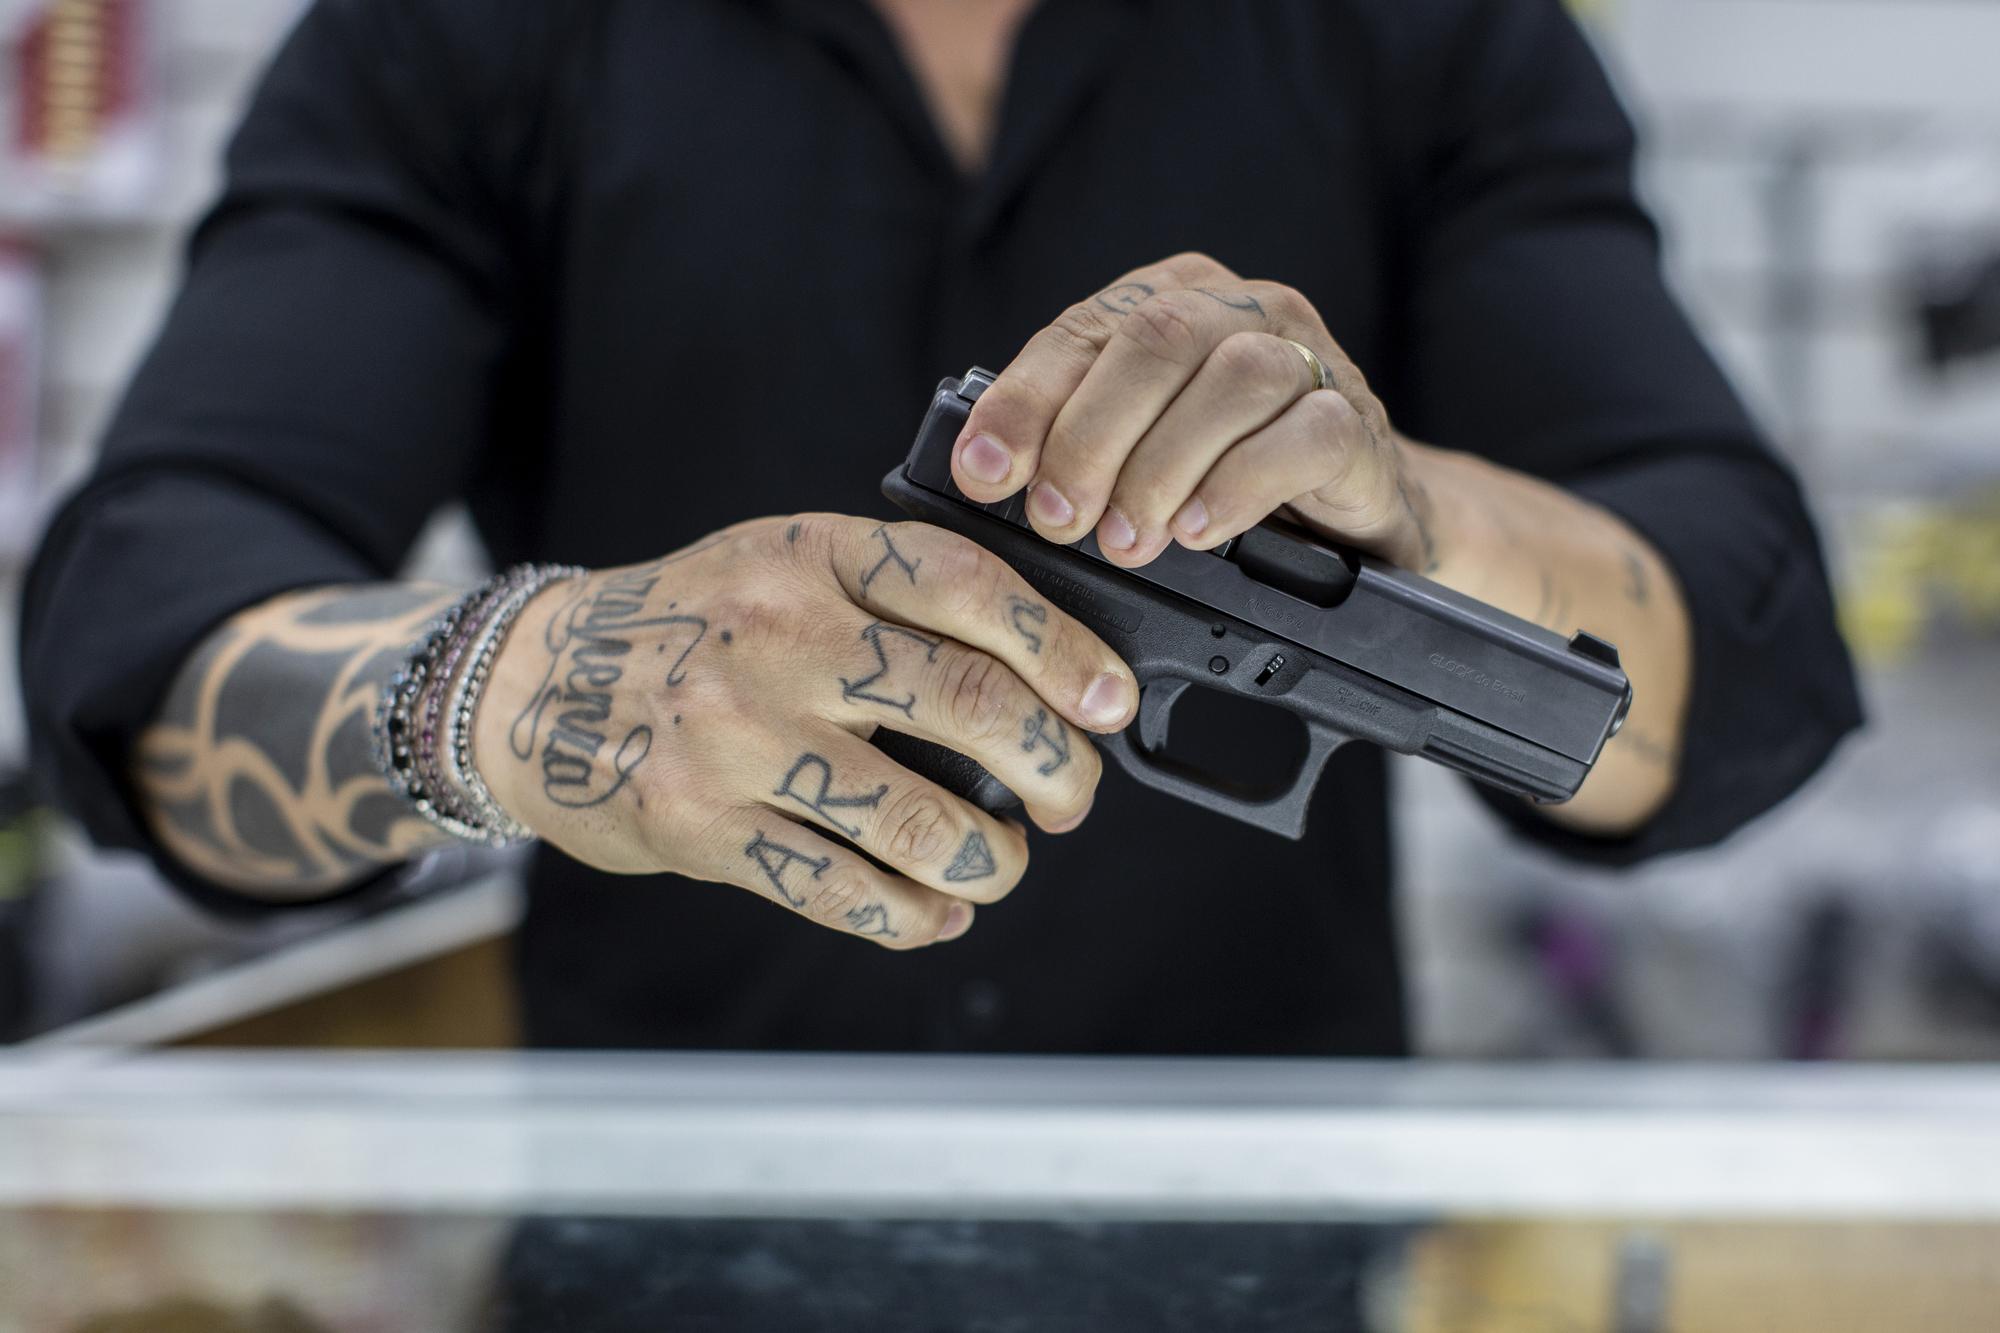 Axl Satier disassembles a handgun in Rio De Janeiro. MUST CREDIT: Photo for The Washington Post by Lianne Milton